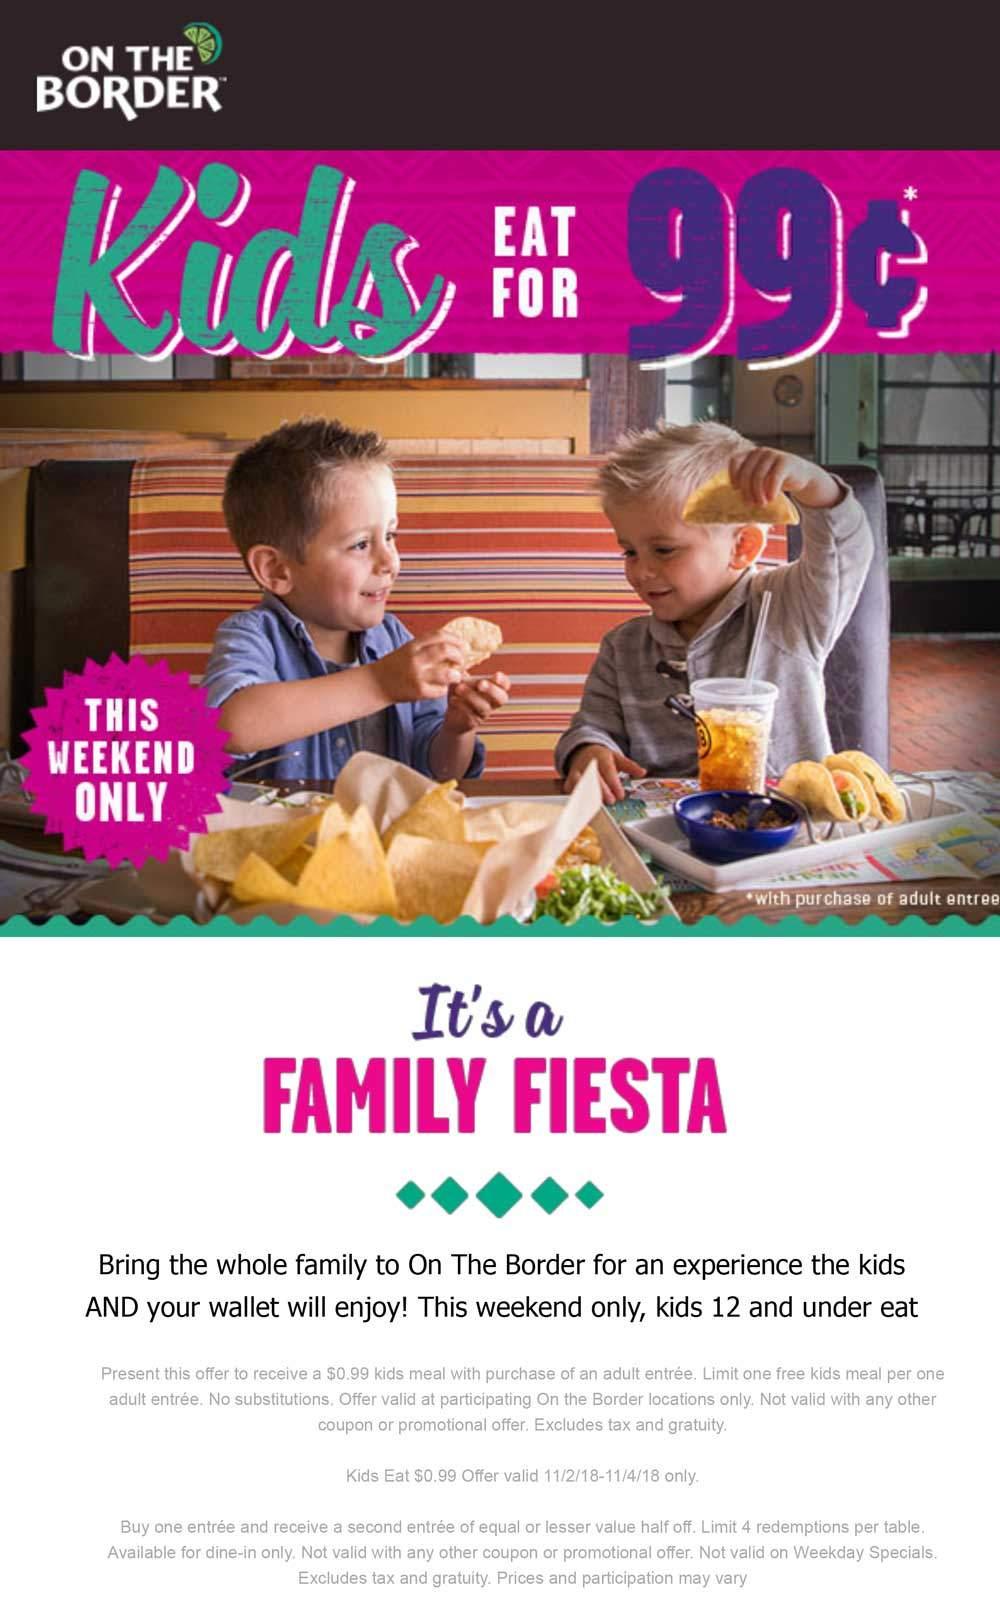 On The Border Coupon November 2019 Kids eat for $1 at On The Border restaurants